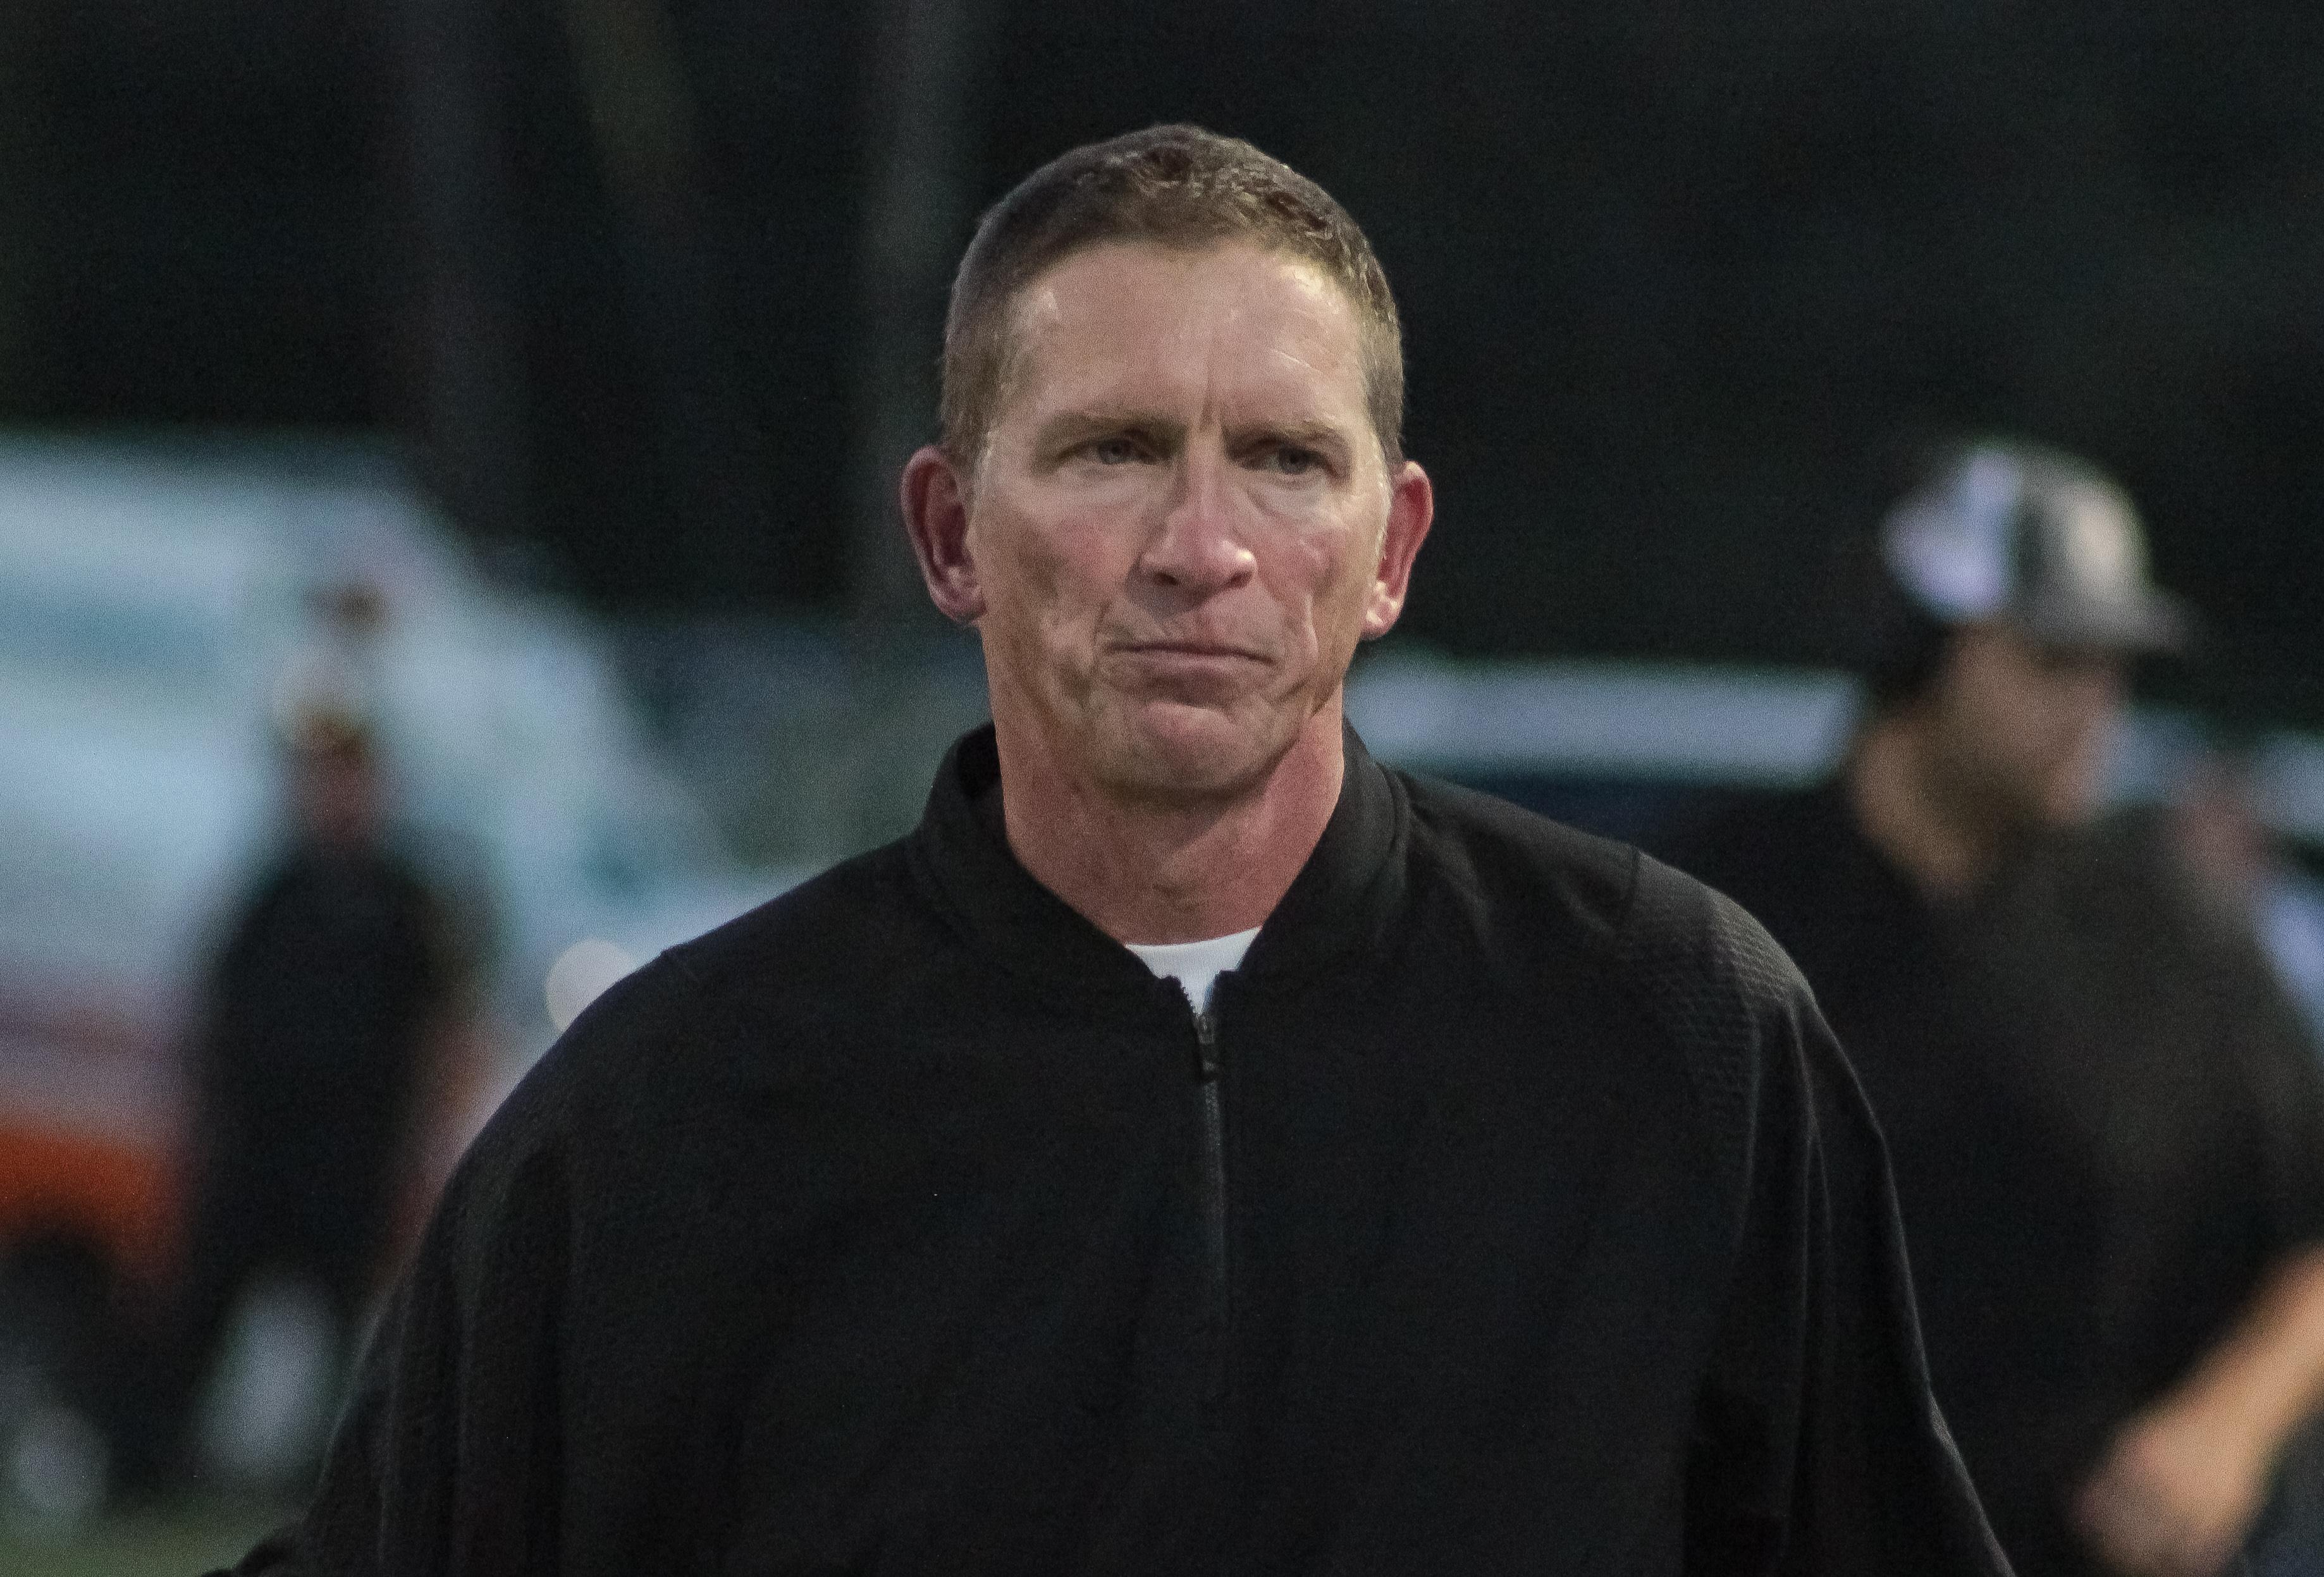 Cullman head coach Oscar Glasscock